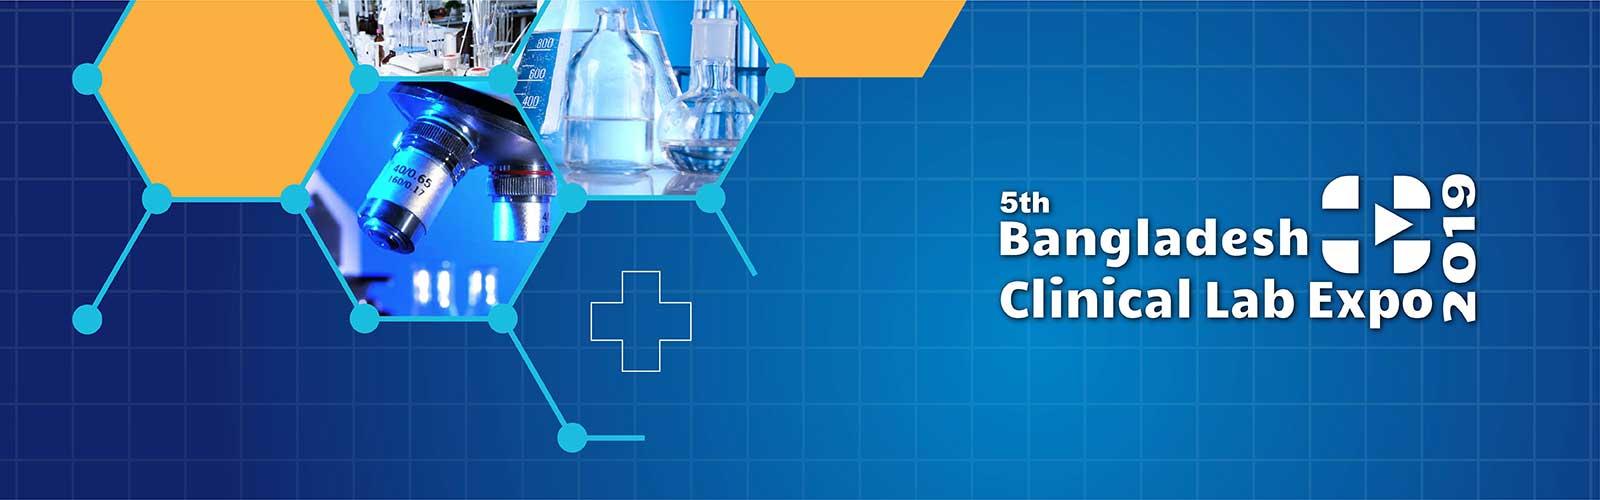 5th Bangladesh Clinical Lab Expo 2019